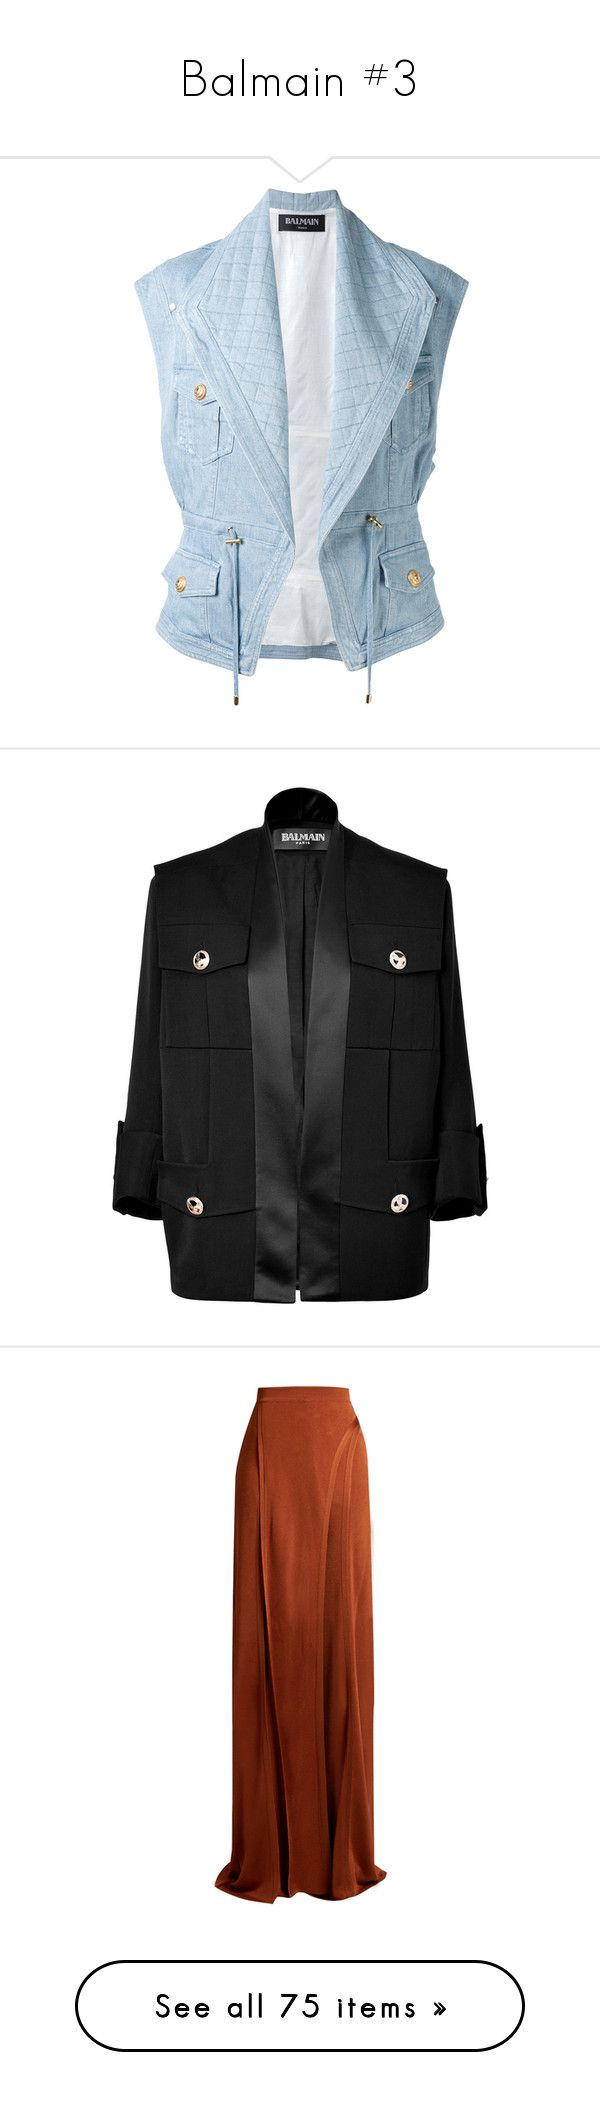 """Balmain #3"" by deborahsauveur ❤ liked on Polyvore featuring outerwear, vests, jackets, blue, quilted gilet, blue waistcoat, denim vests, gilet vest, denim waistcoat and black"